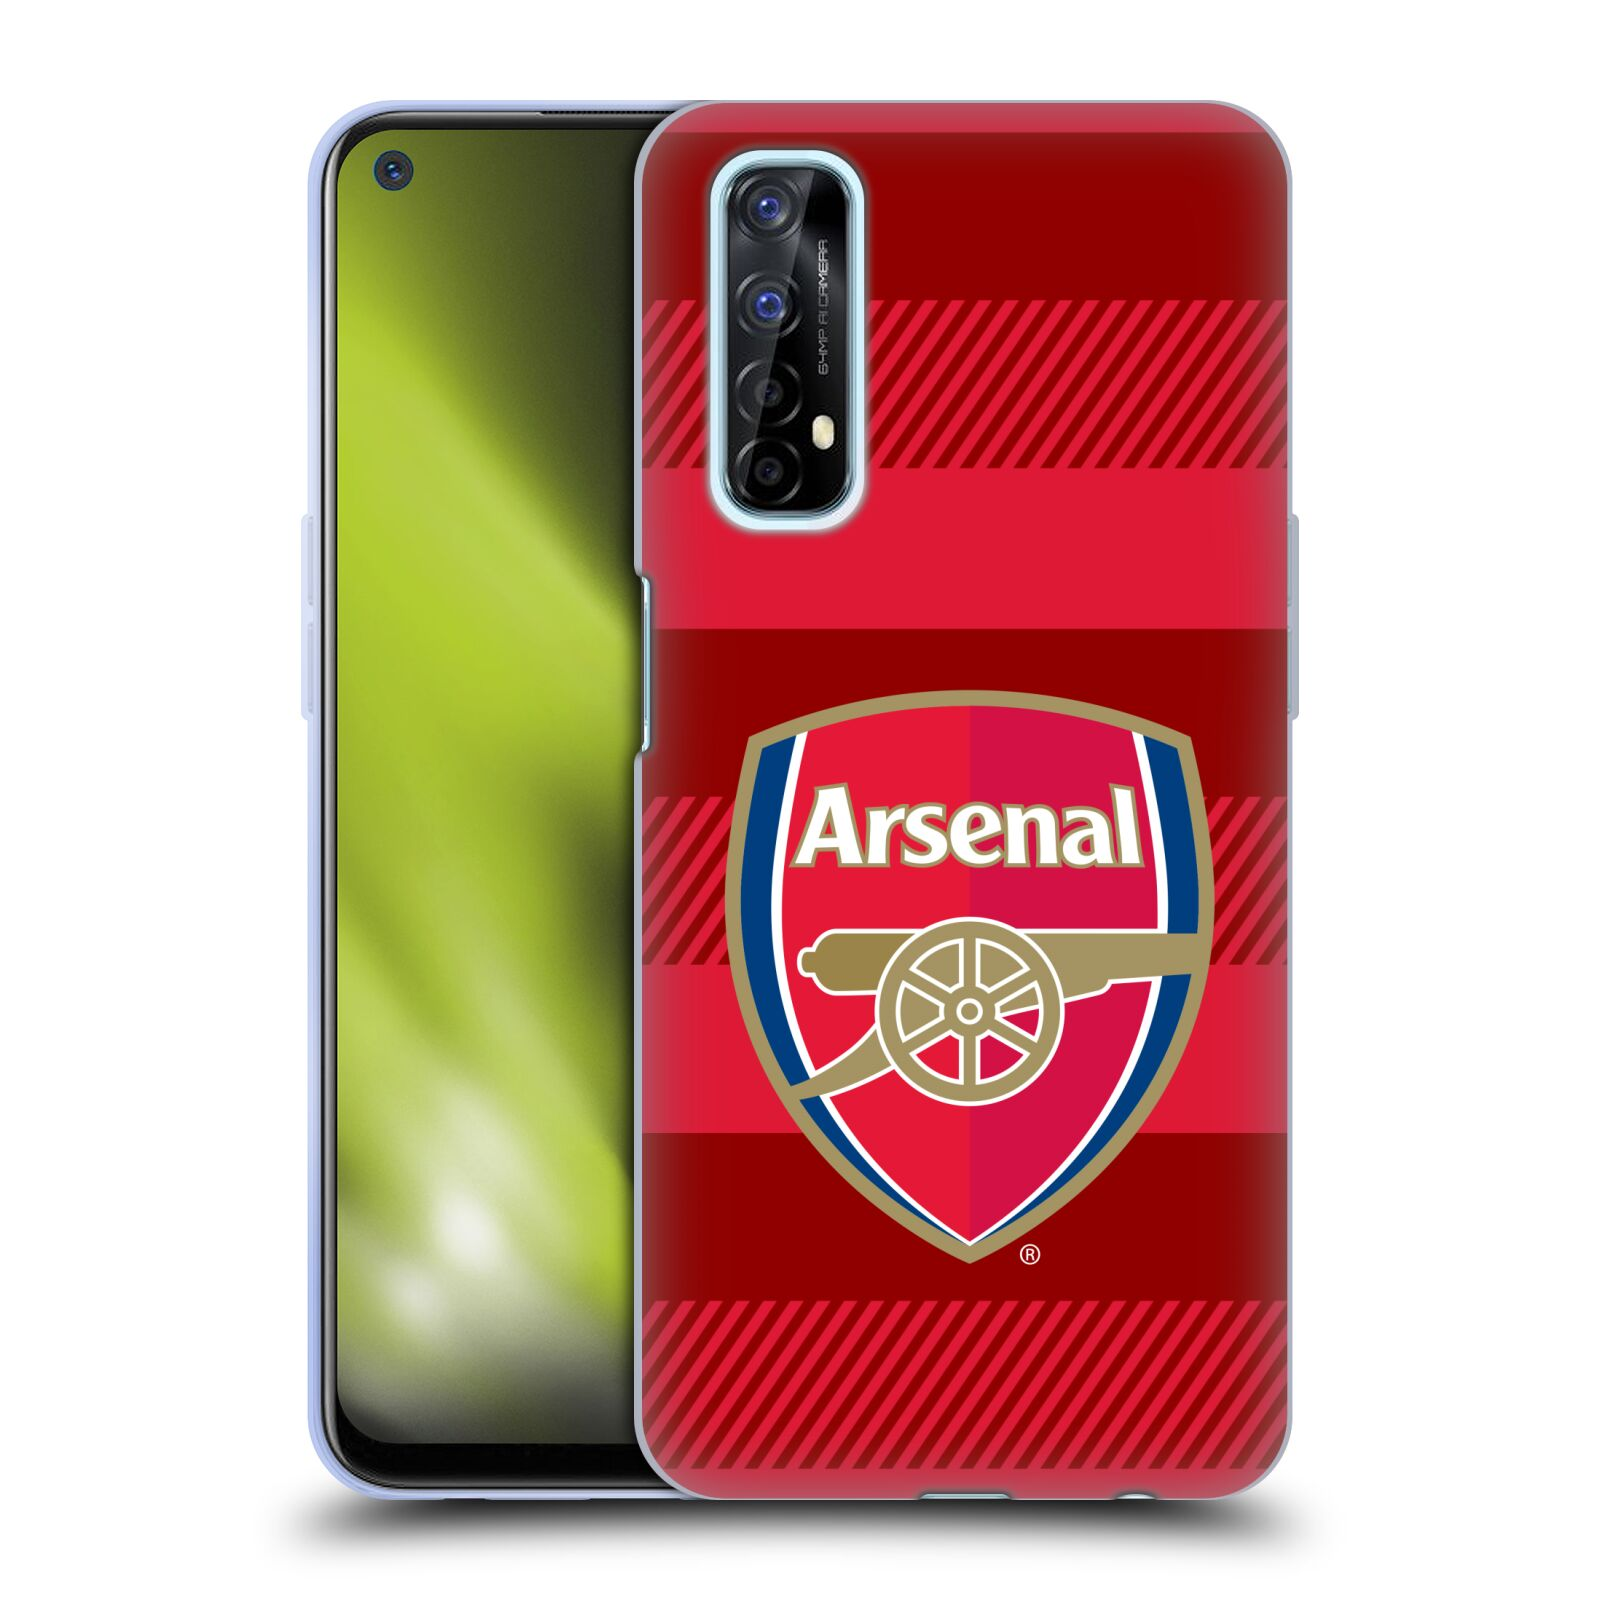 Silikonové pouzdro na mobil Realme 7 - Head Case - Arsenal FC - Logo s pruhy